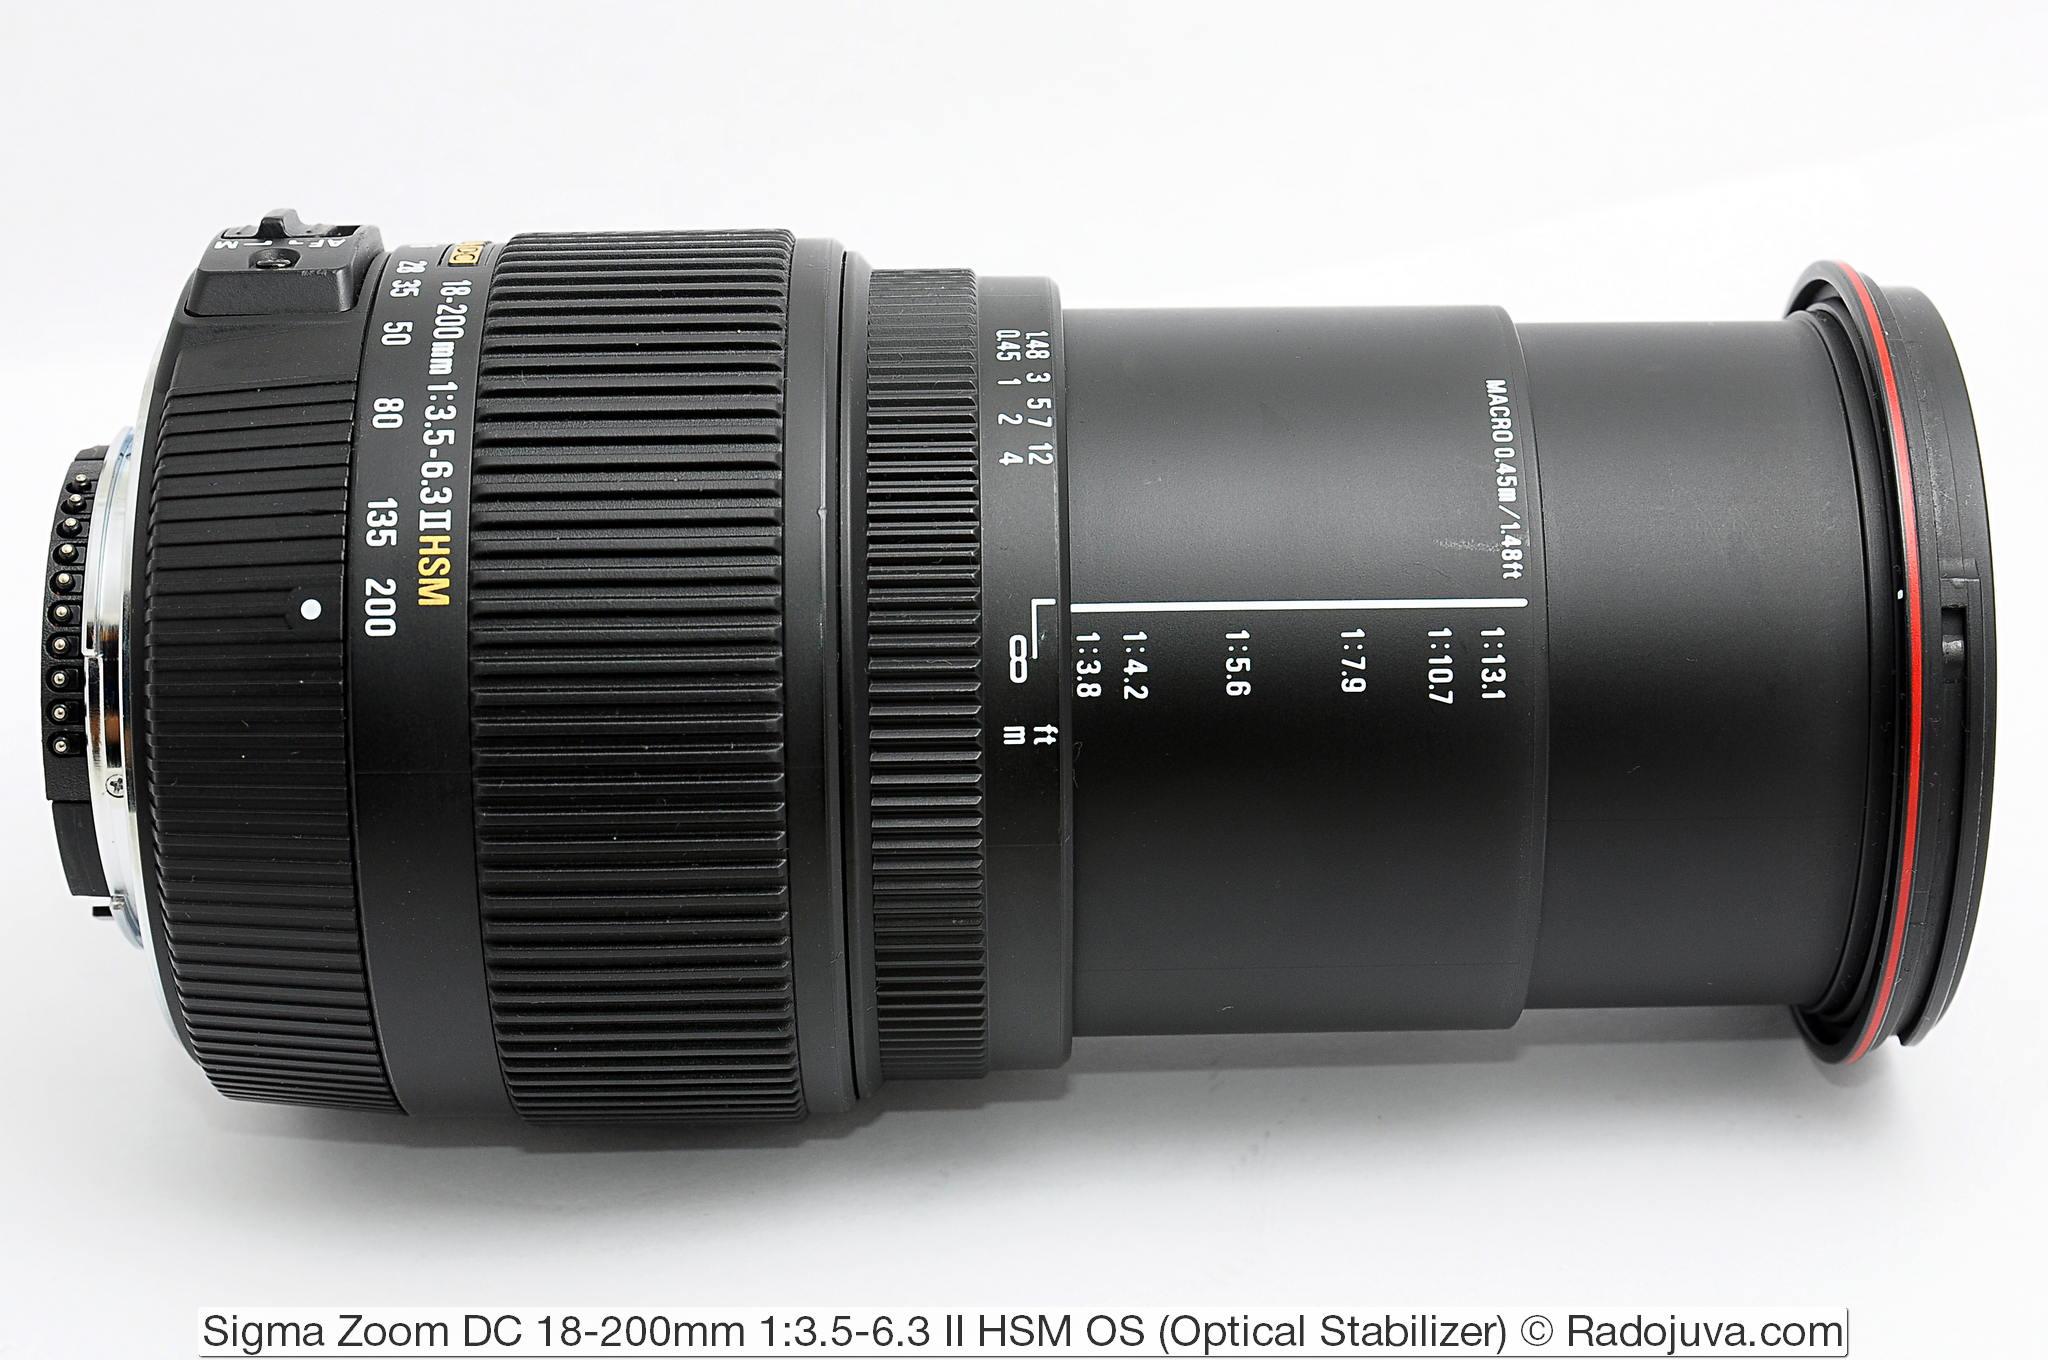 Sigma Zoom DC 18-200mm 1:3.5-6.3 II HSM OS